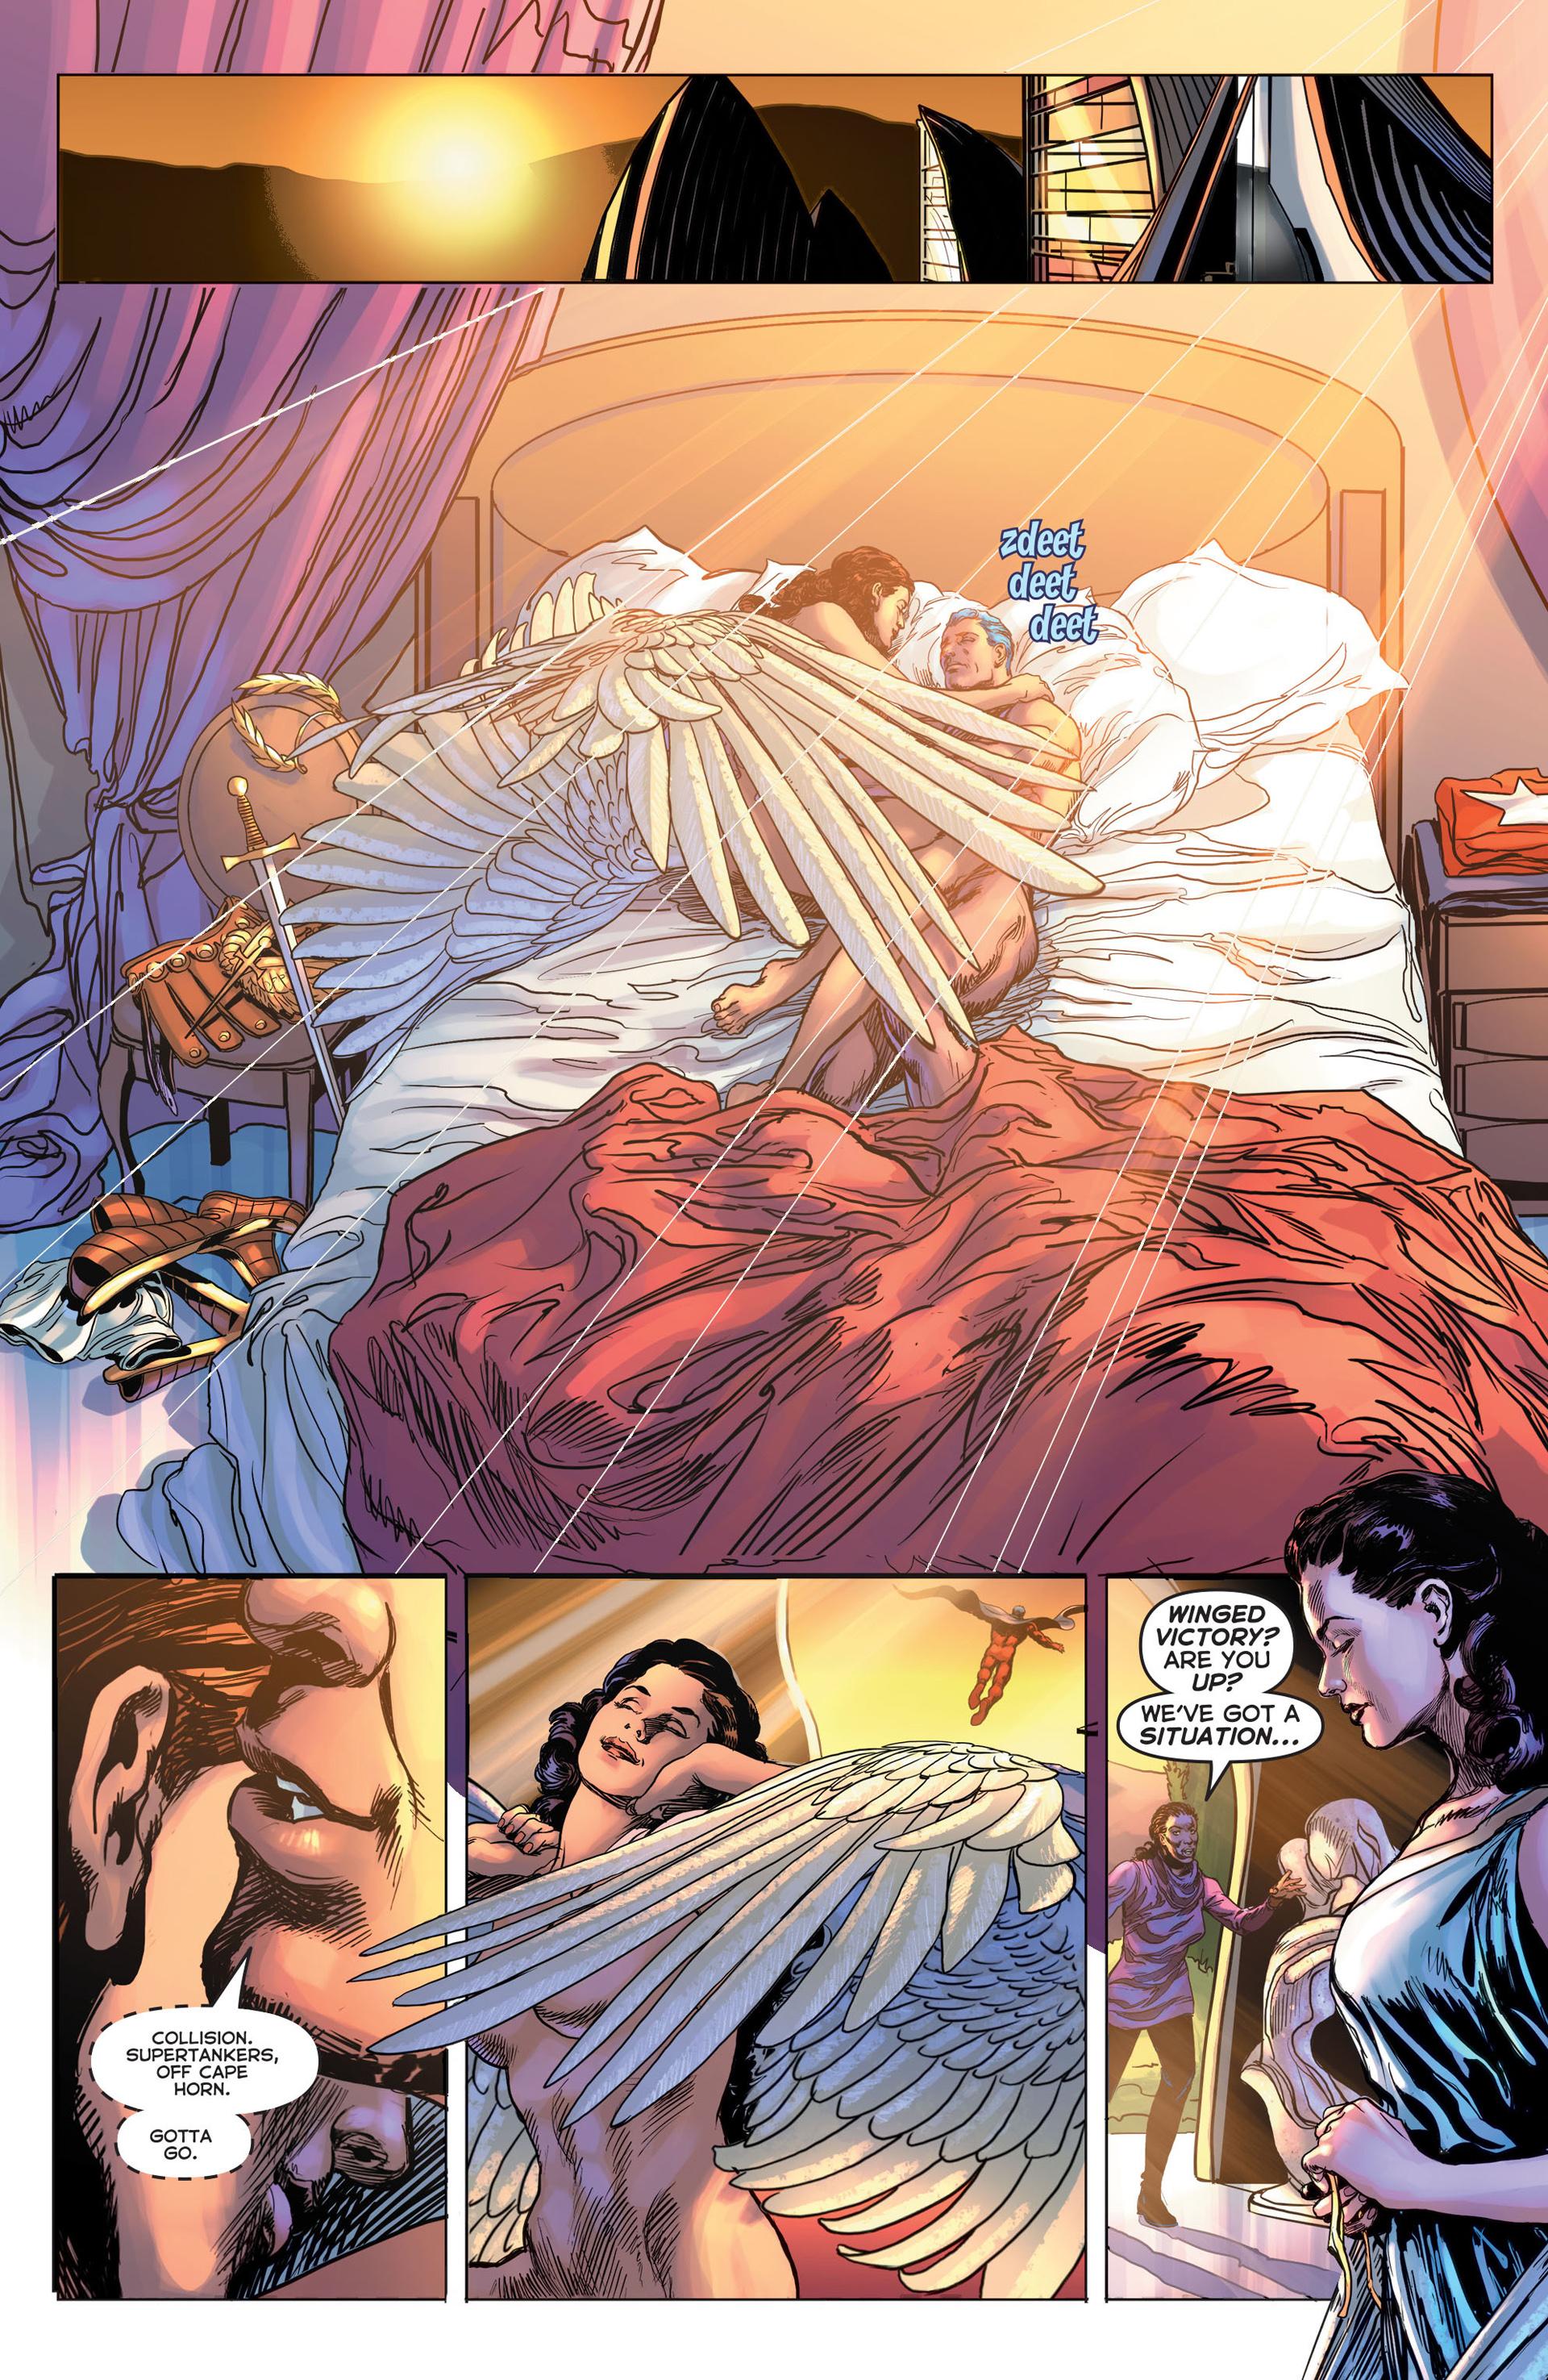 Read online Astro City comic -  Issue #7 - 7